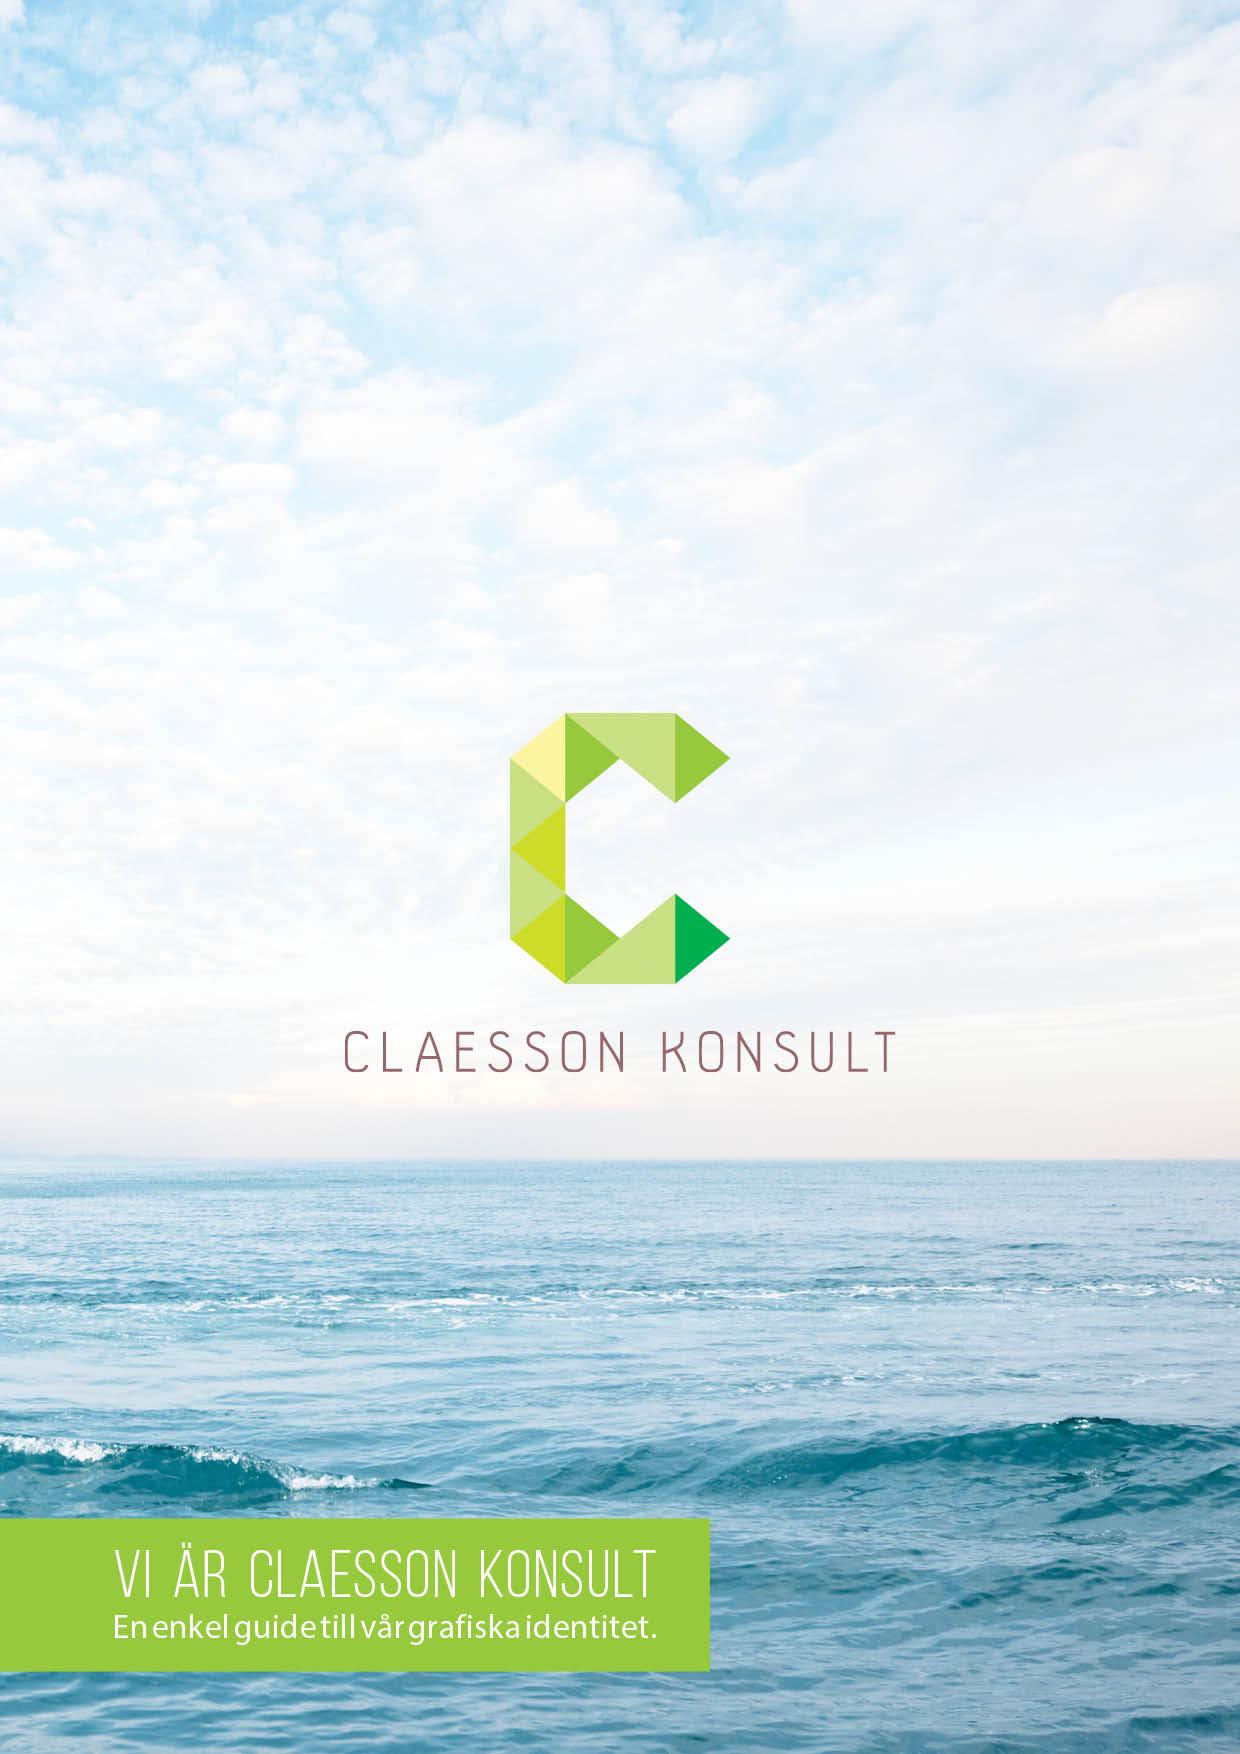 Claesson Konsult - Grafisk ID